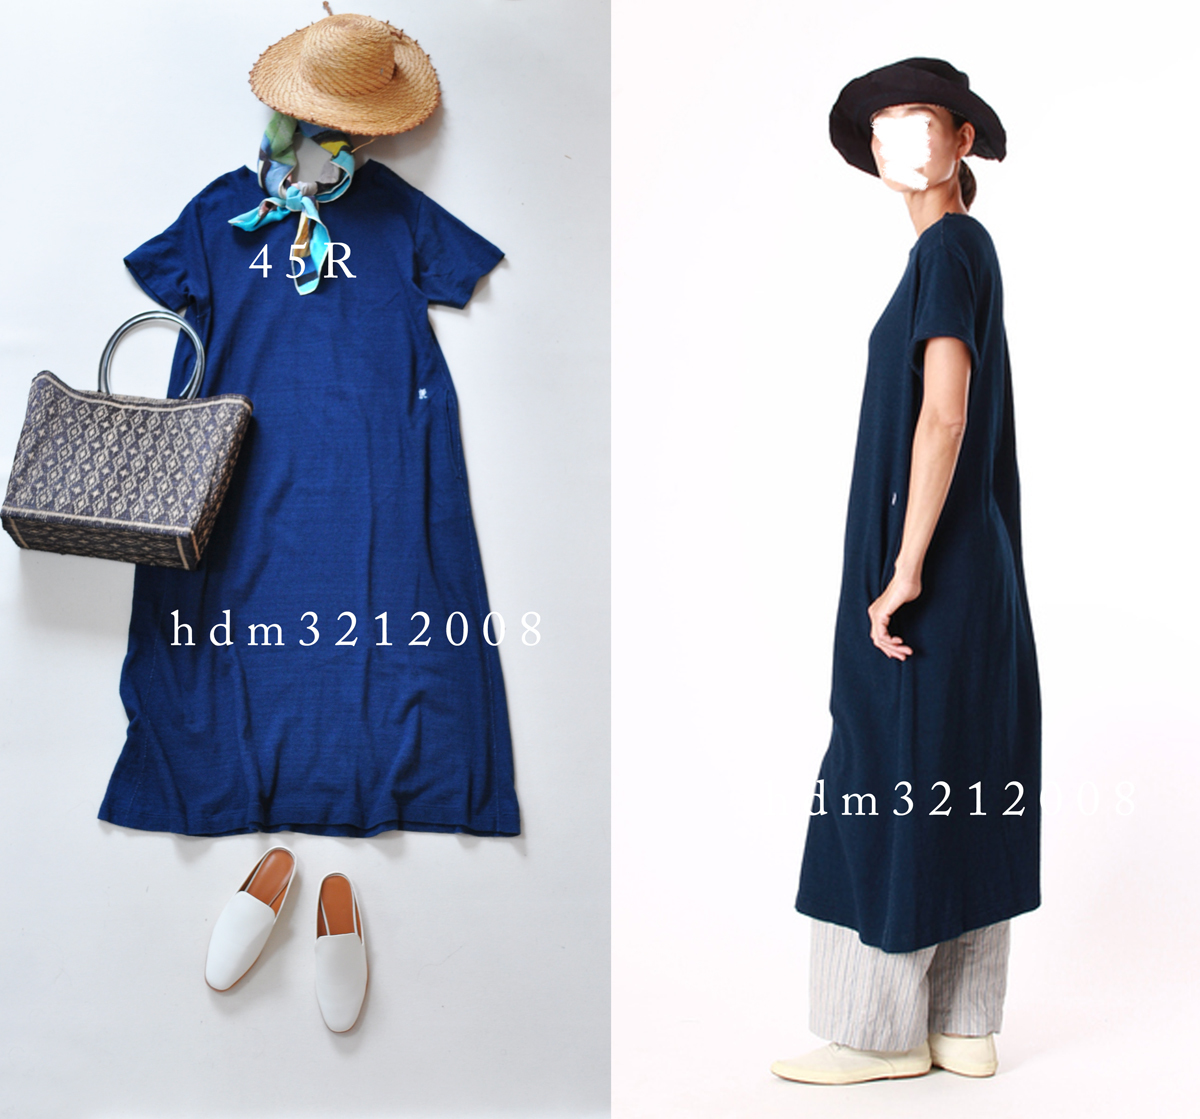 45R インディゴアートピケ天竺DRESS ワンピース 45RPM